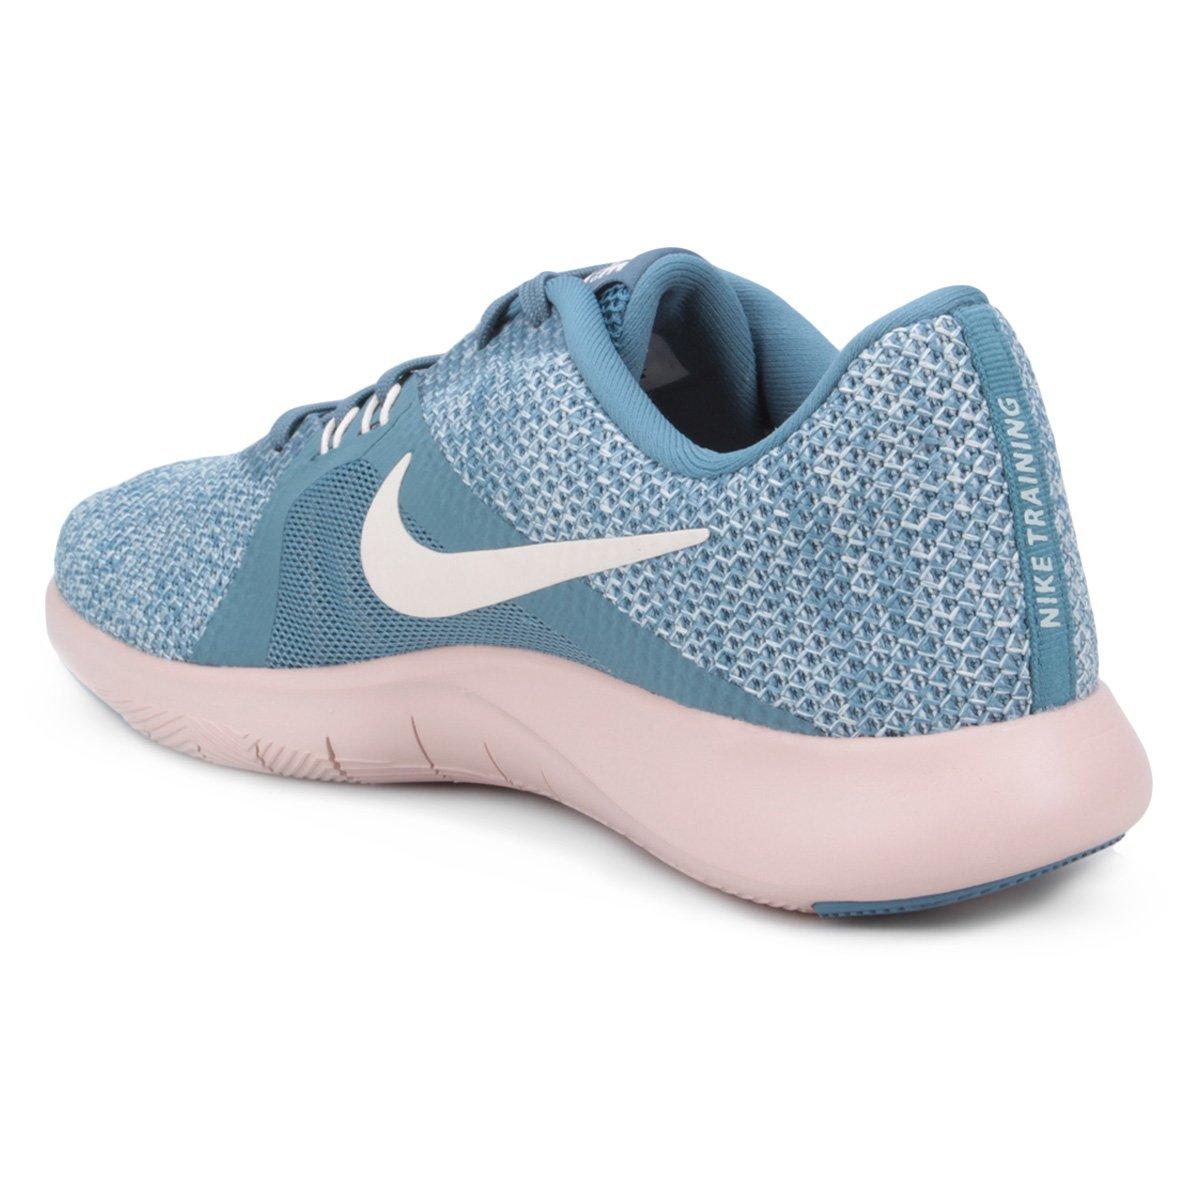 Tenis Nike Flex Trainer 8 Feminino Tam 35 Shopping Tudoazul